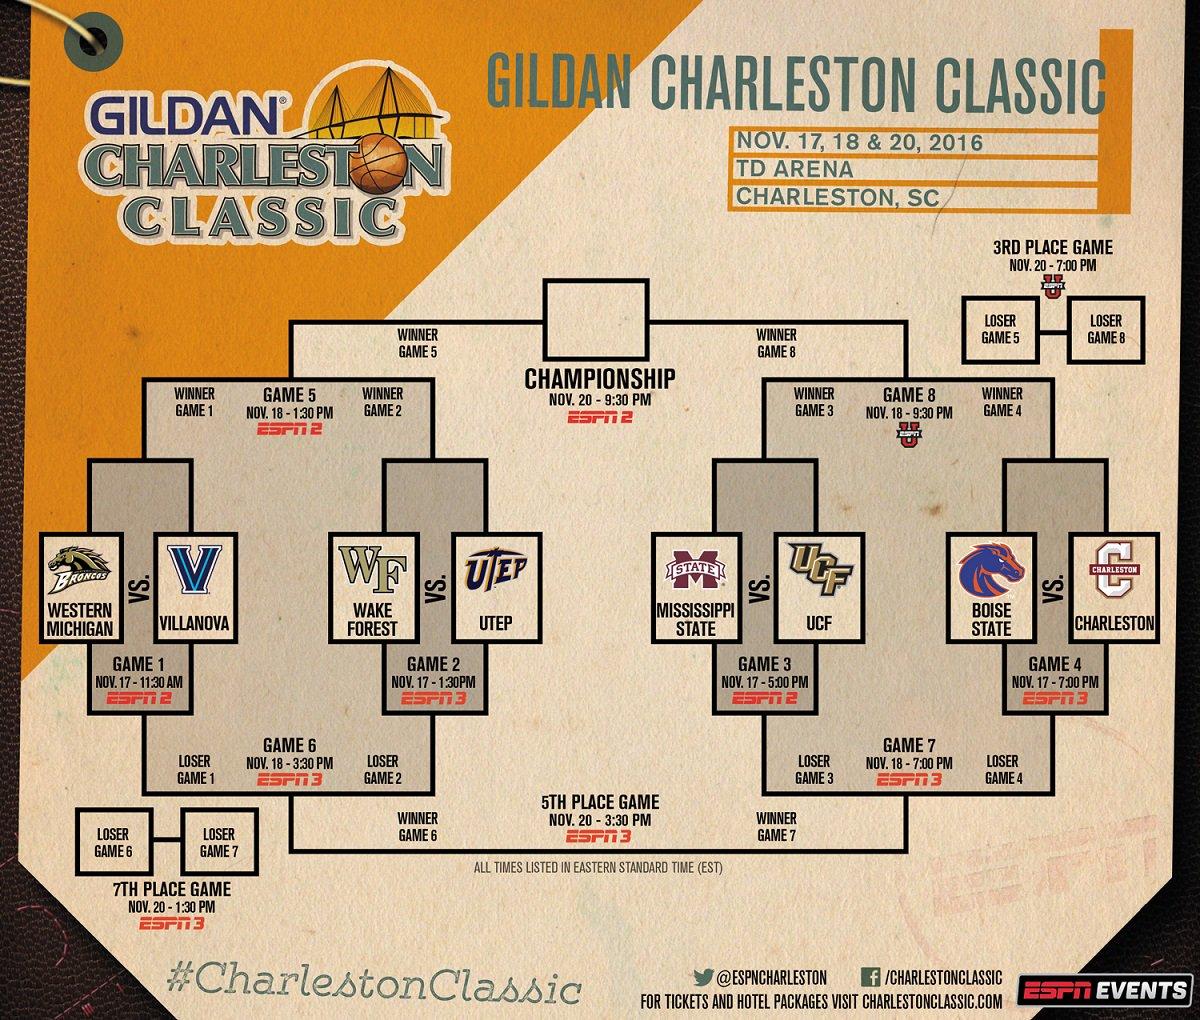 2016 Gildan Charleston Classic Bracket